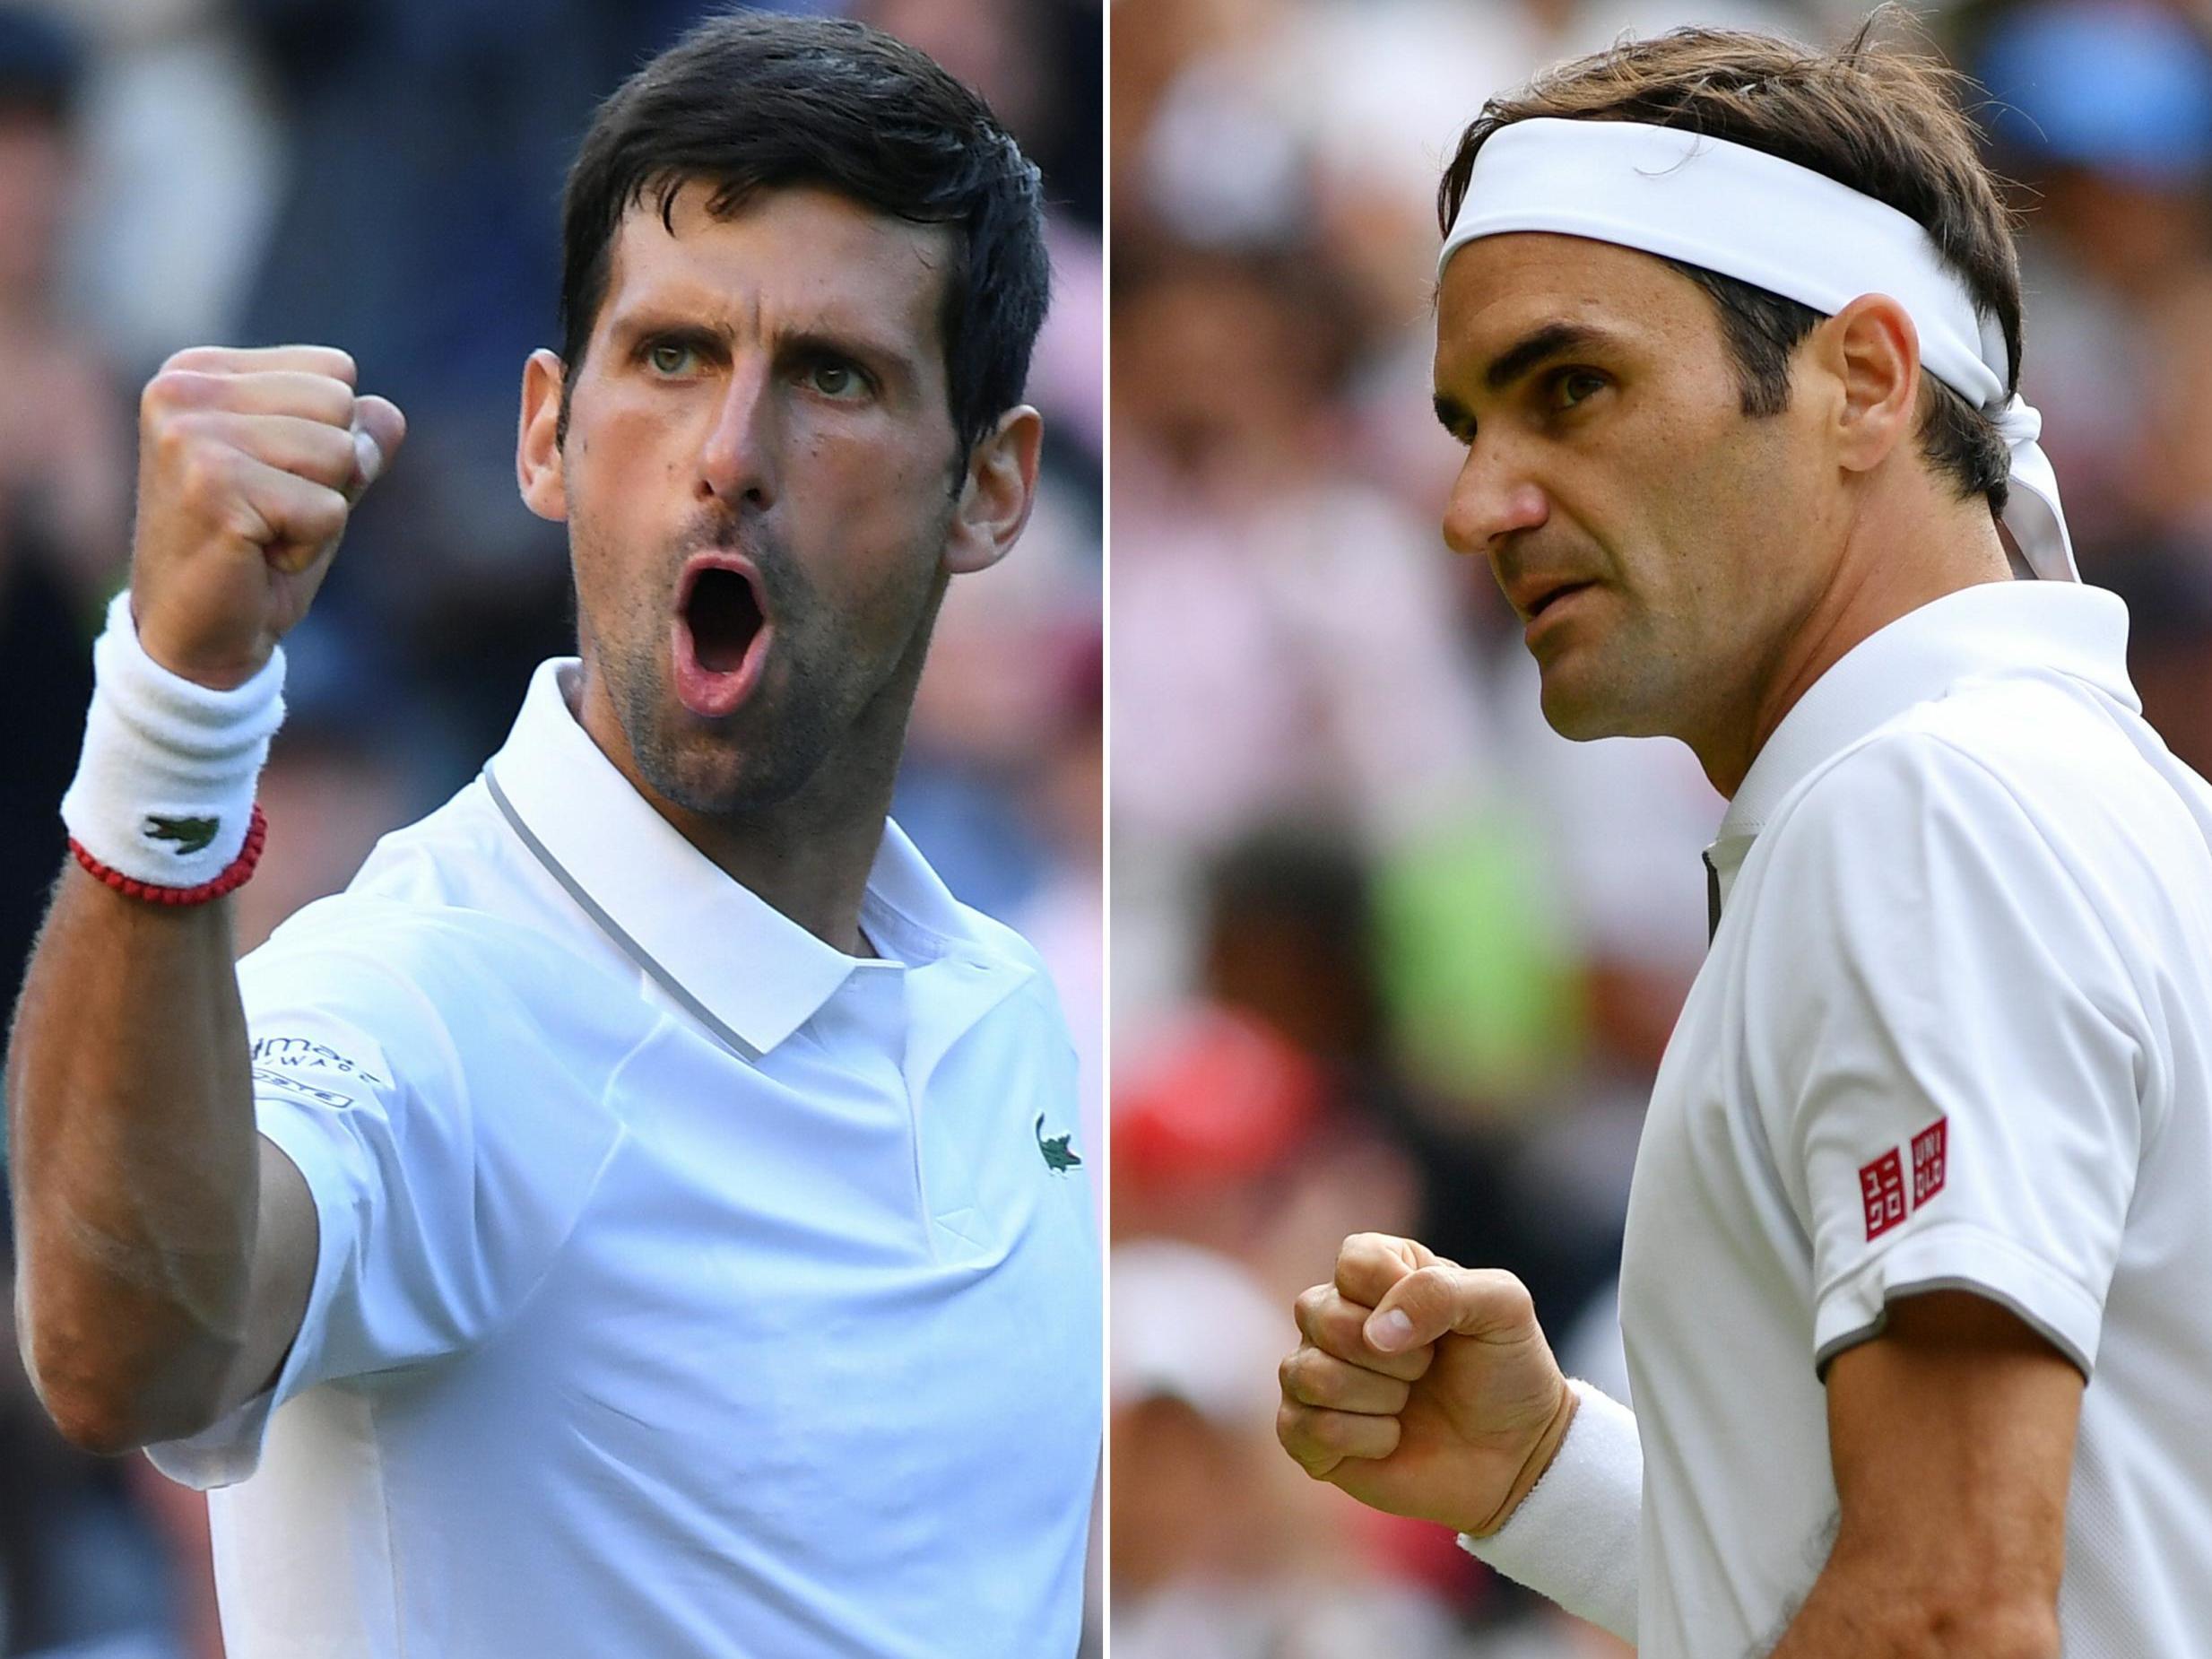 Wimbledon 2019 LIVE: Roger Federer vs Novak Djokovic latest score and updates from Centre Court